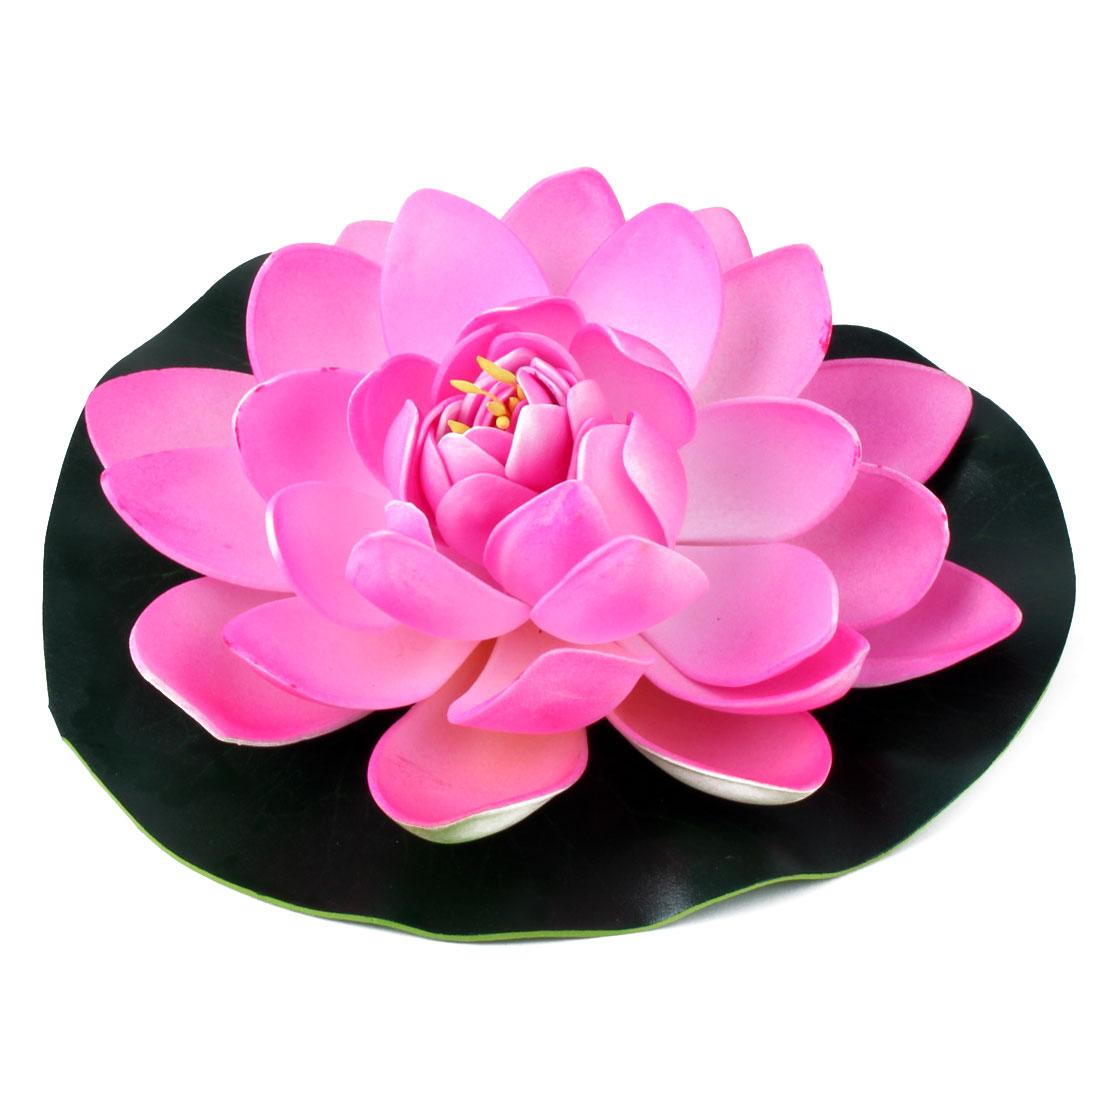 Aquarium Fish Tank Pond Foam Simulation Floating Lotus Flower Decor Green Pink